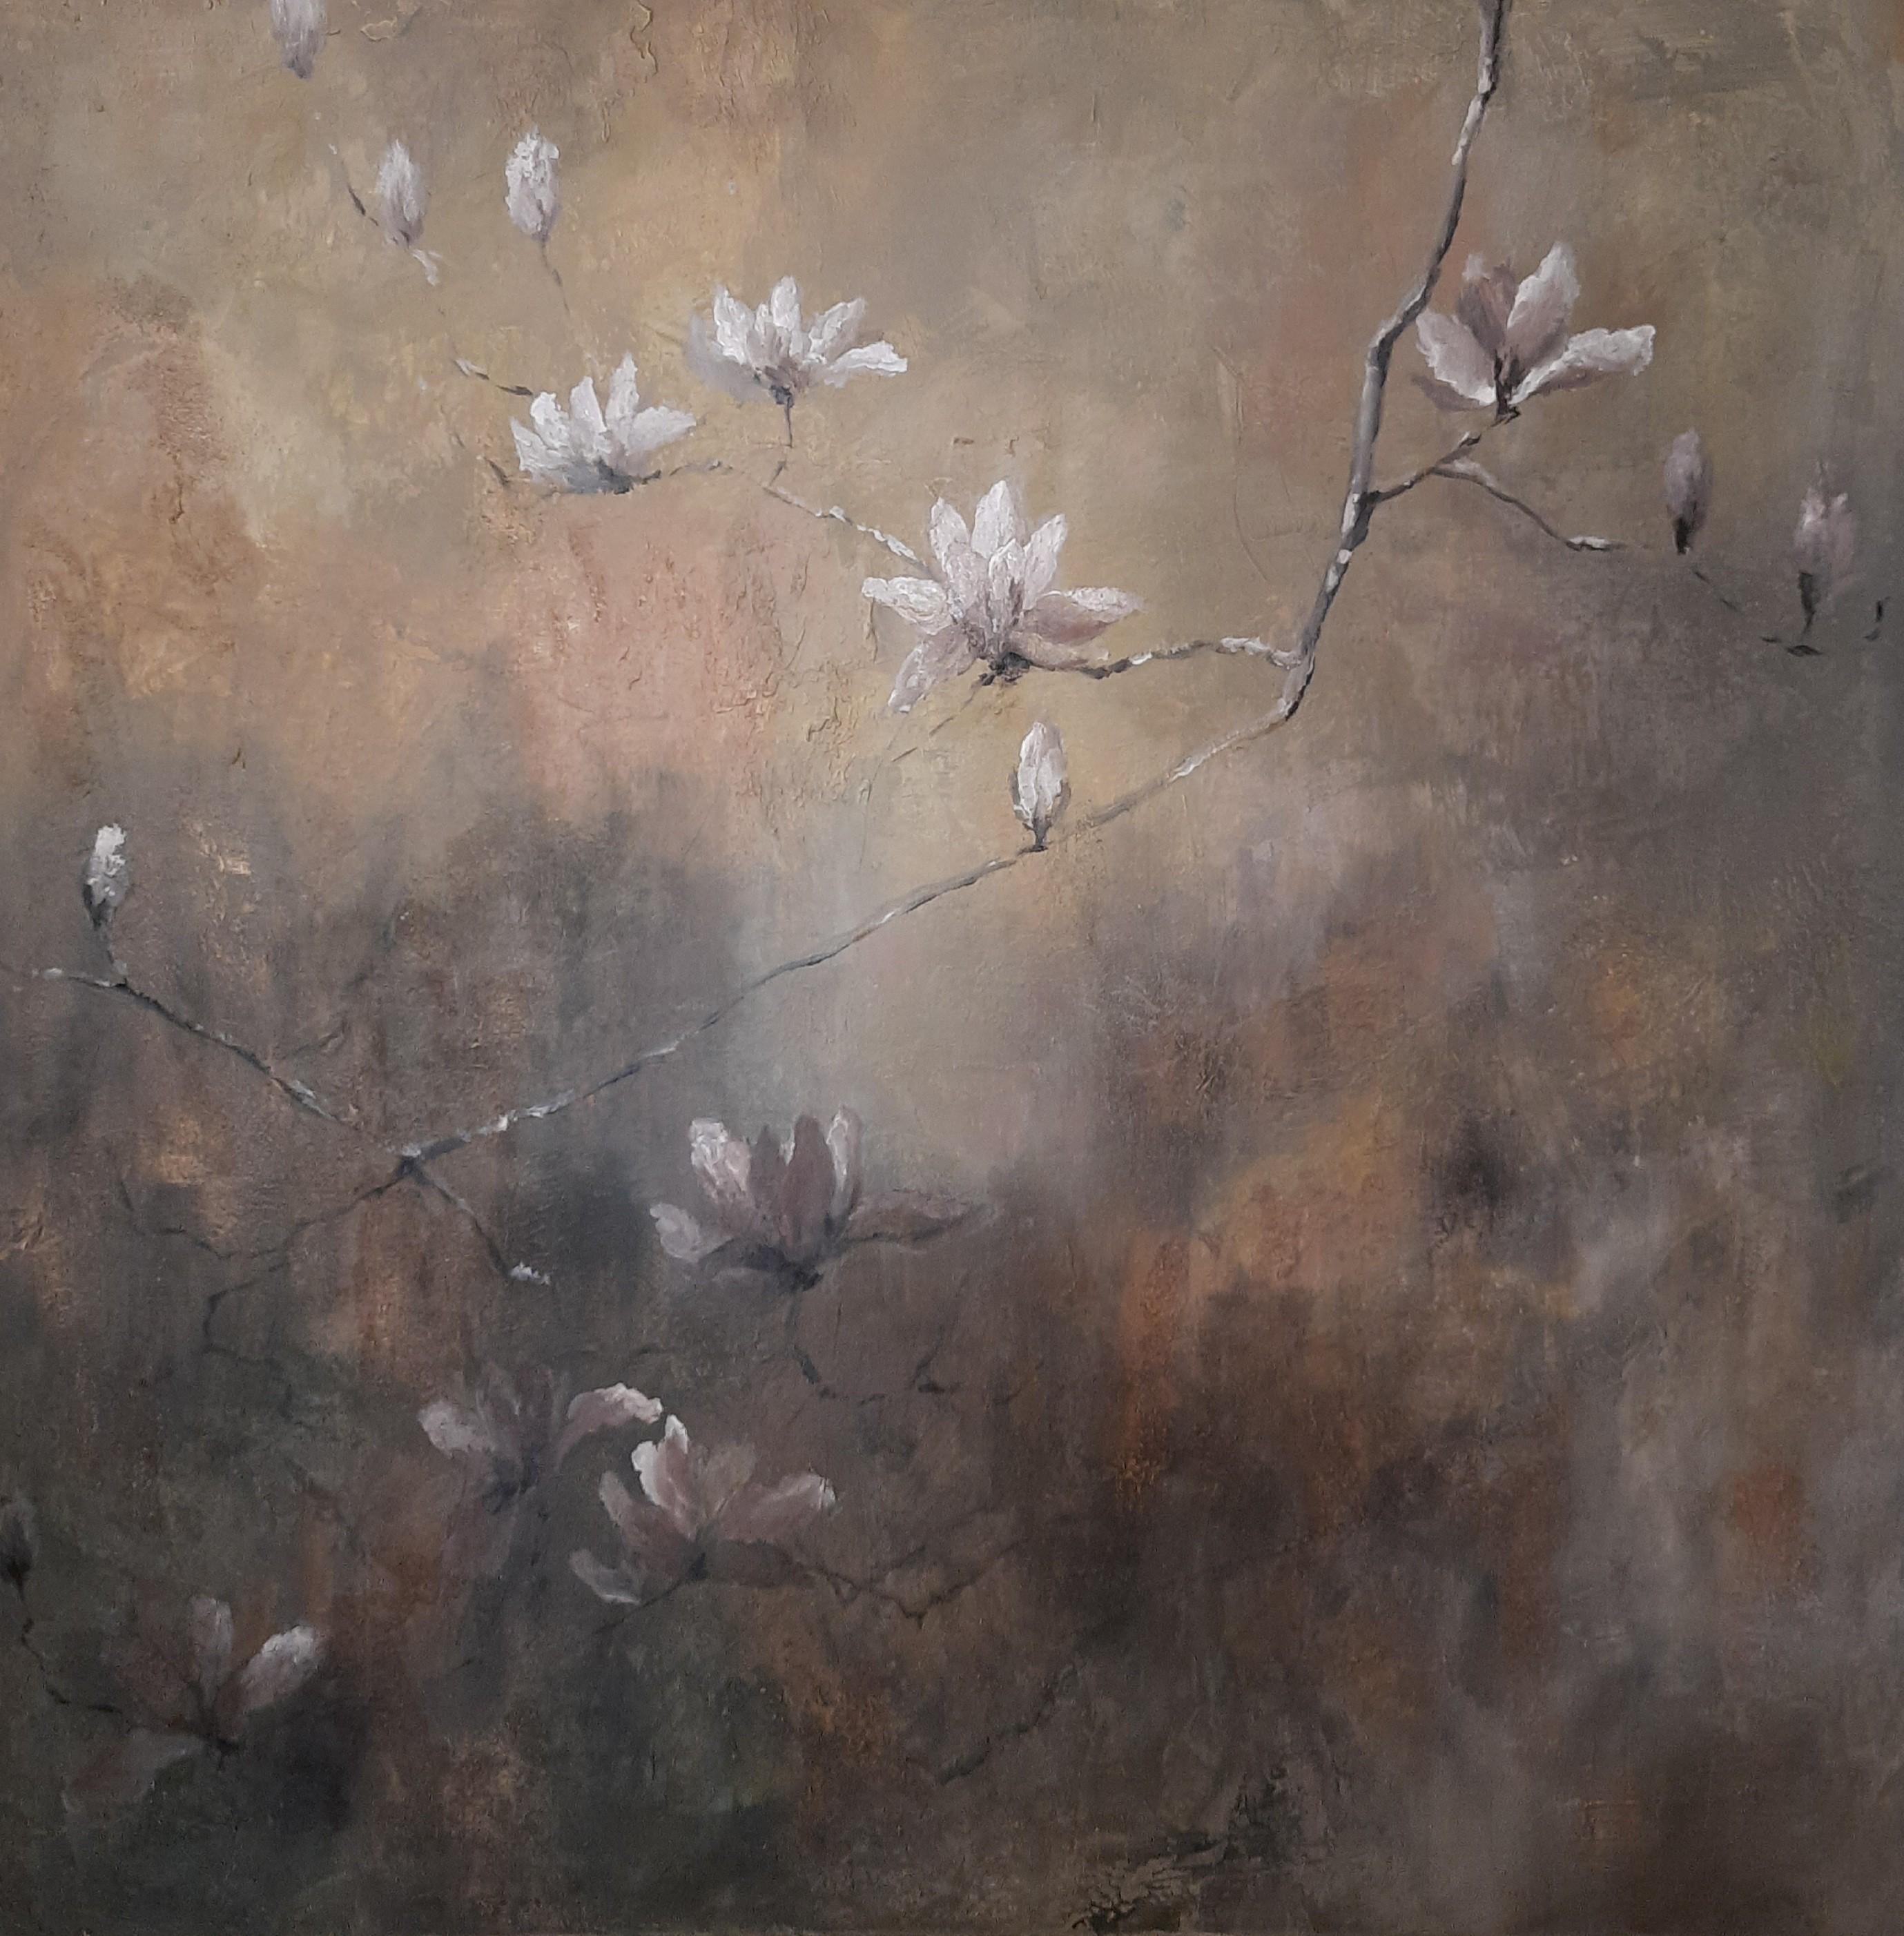 Sweet magnolias by Jean wijesekera